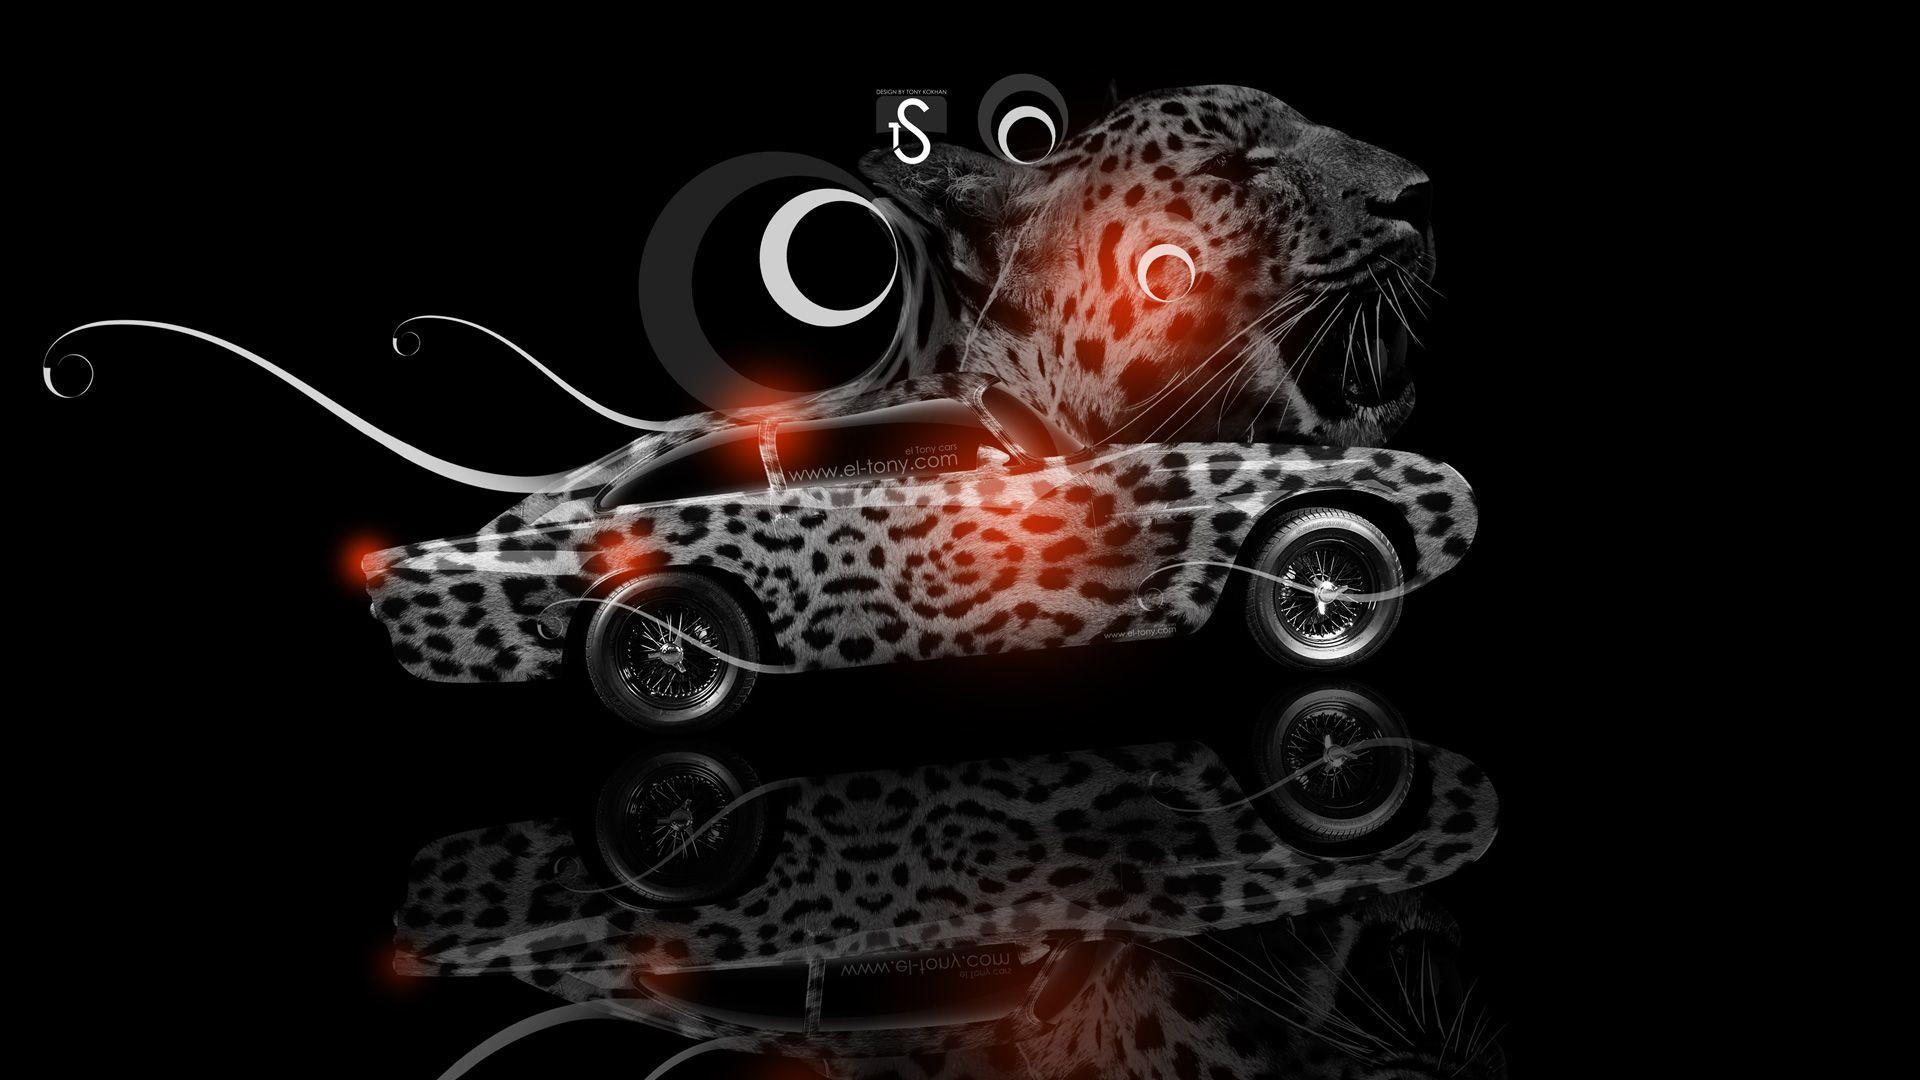 Nice Neon Leopard Wallpaper | Aston Martin DB4 Fantasy Leopard Car 2013 Orange Neon HD Wallpapers  .